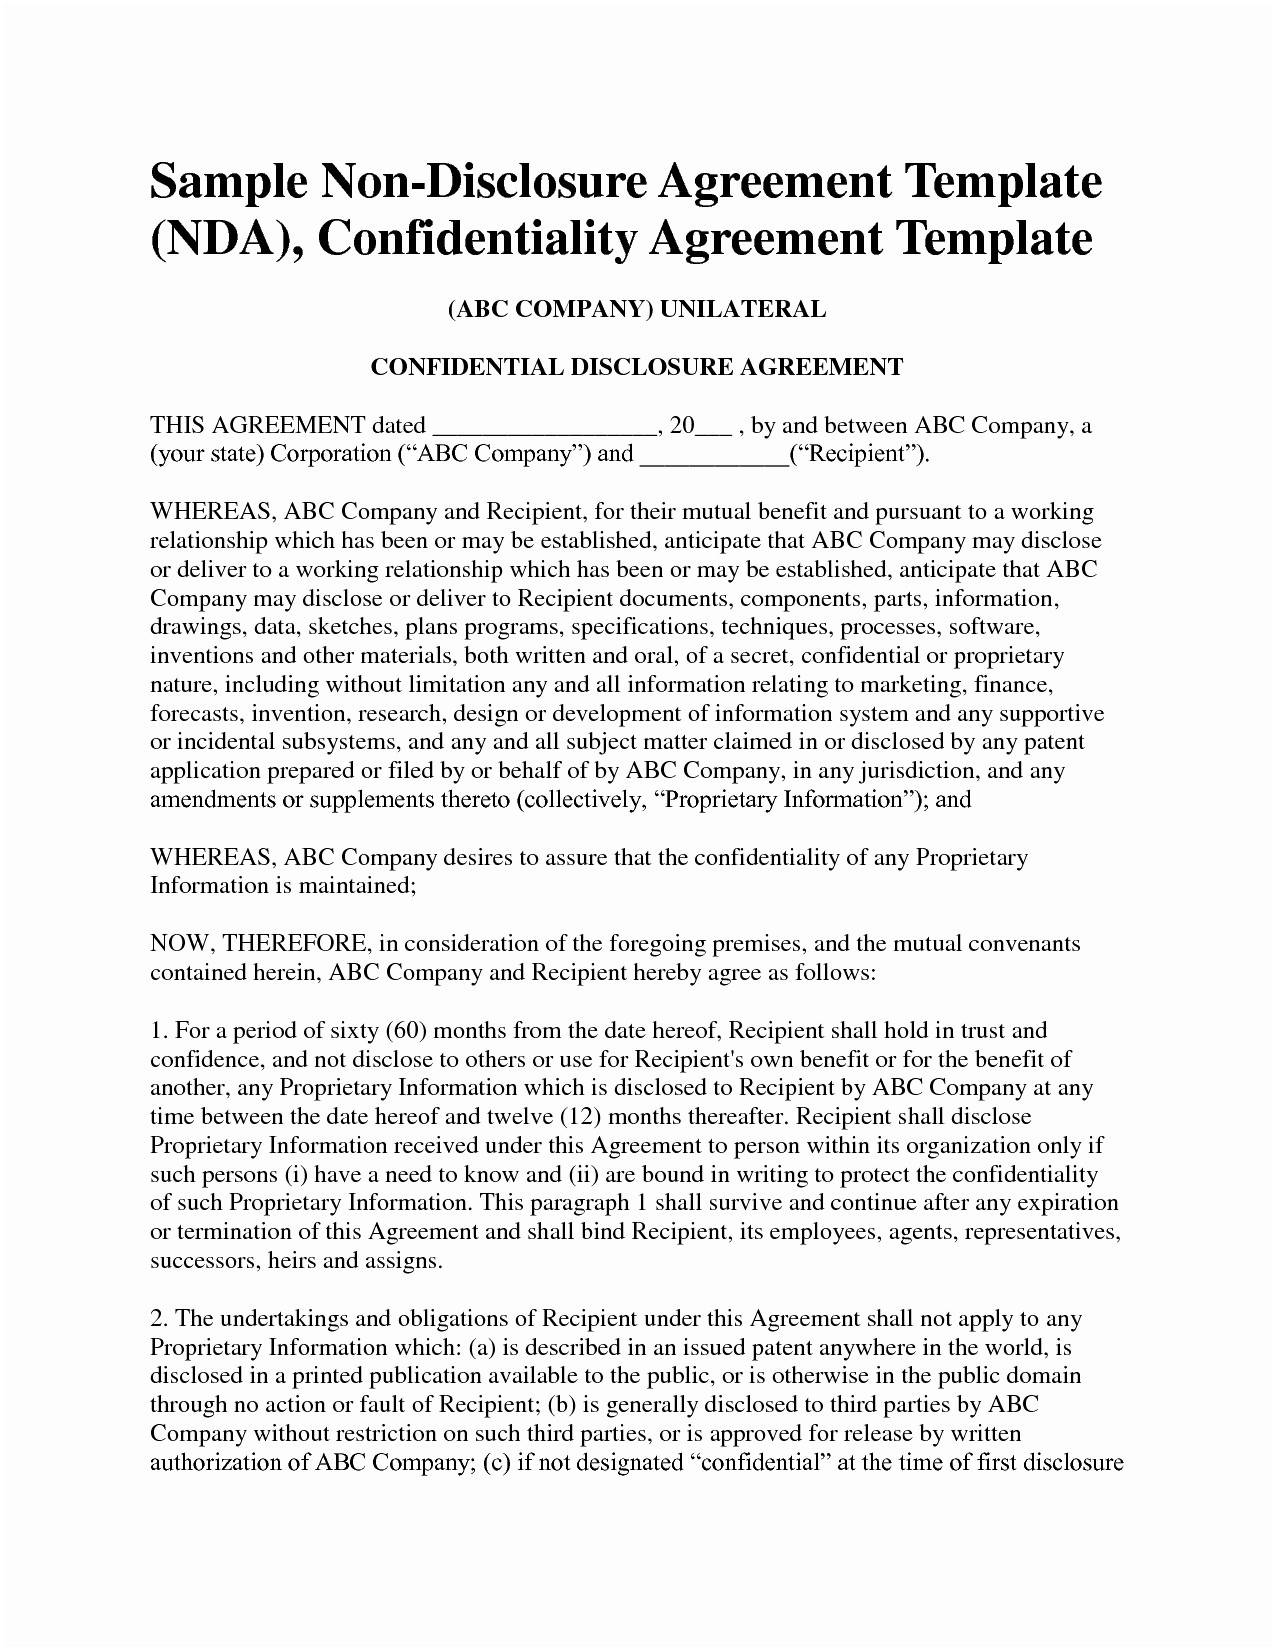 Sample Affiliate Agreement Template